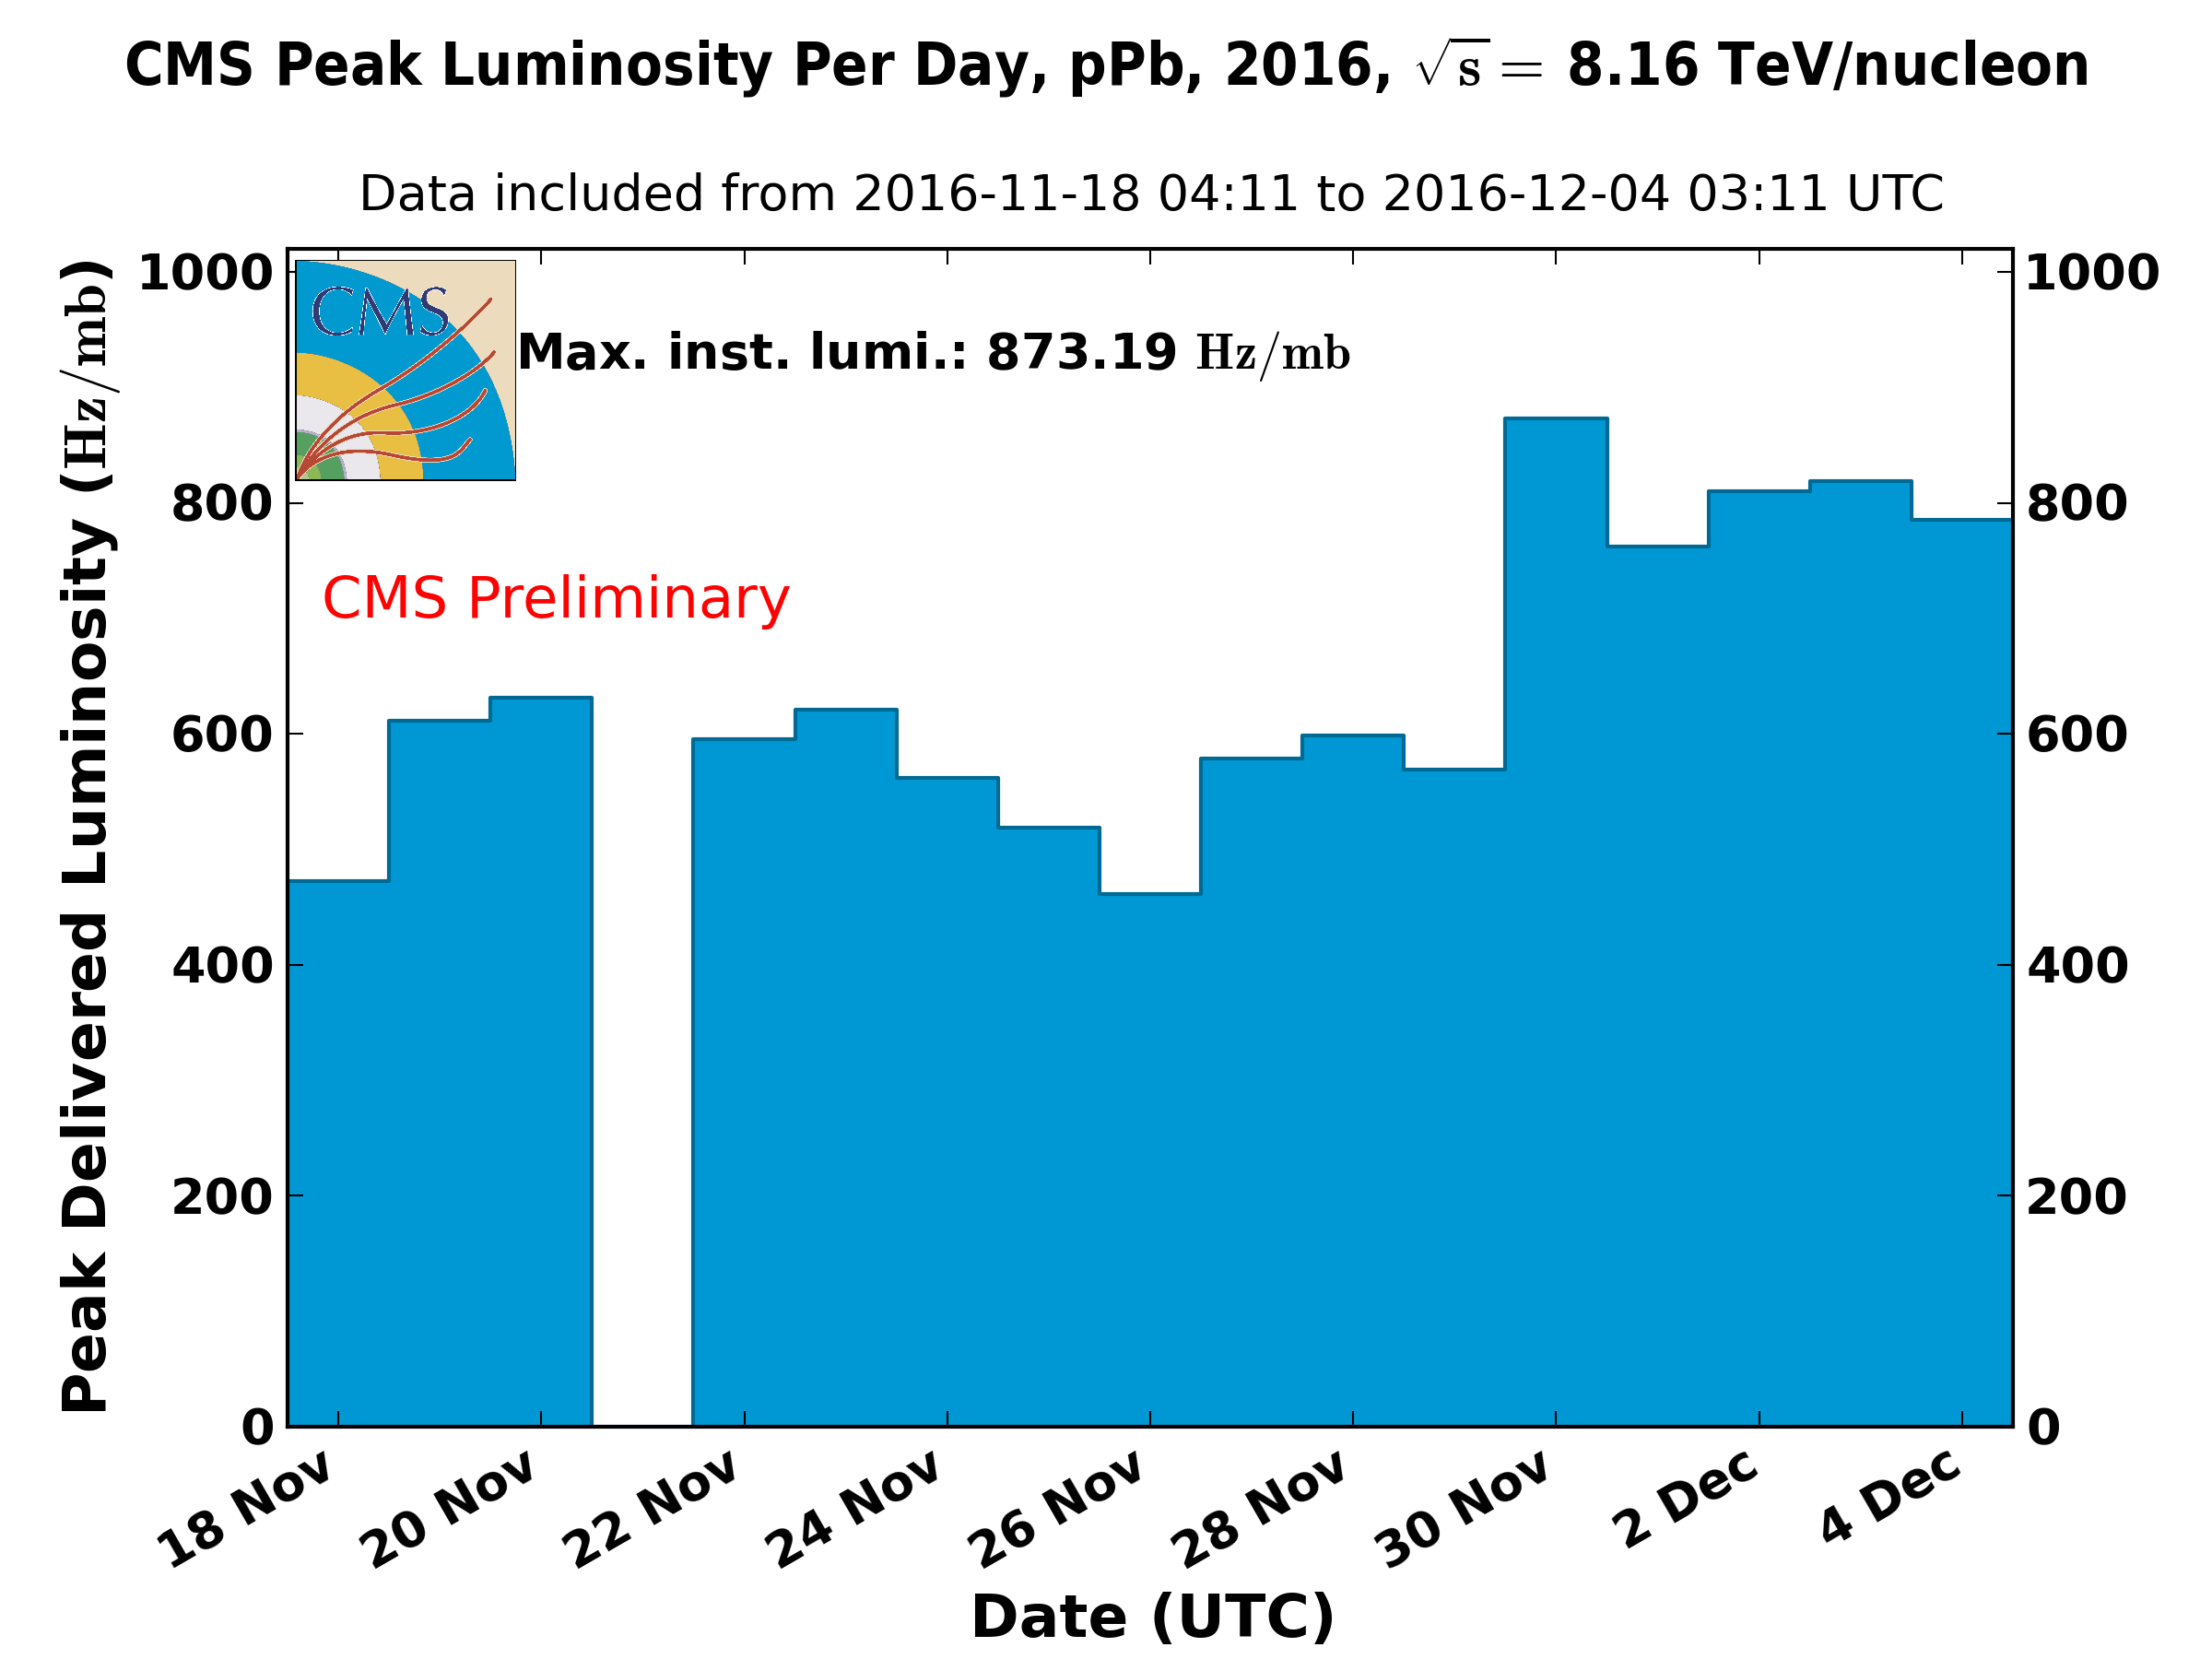 https://cern.ch/cmslumi/publicplots/peak_lumi_per_day_ppb_2016NormtagLumi8TeVPPb.png